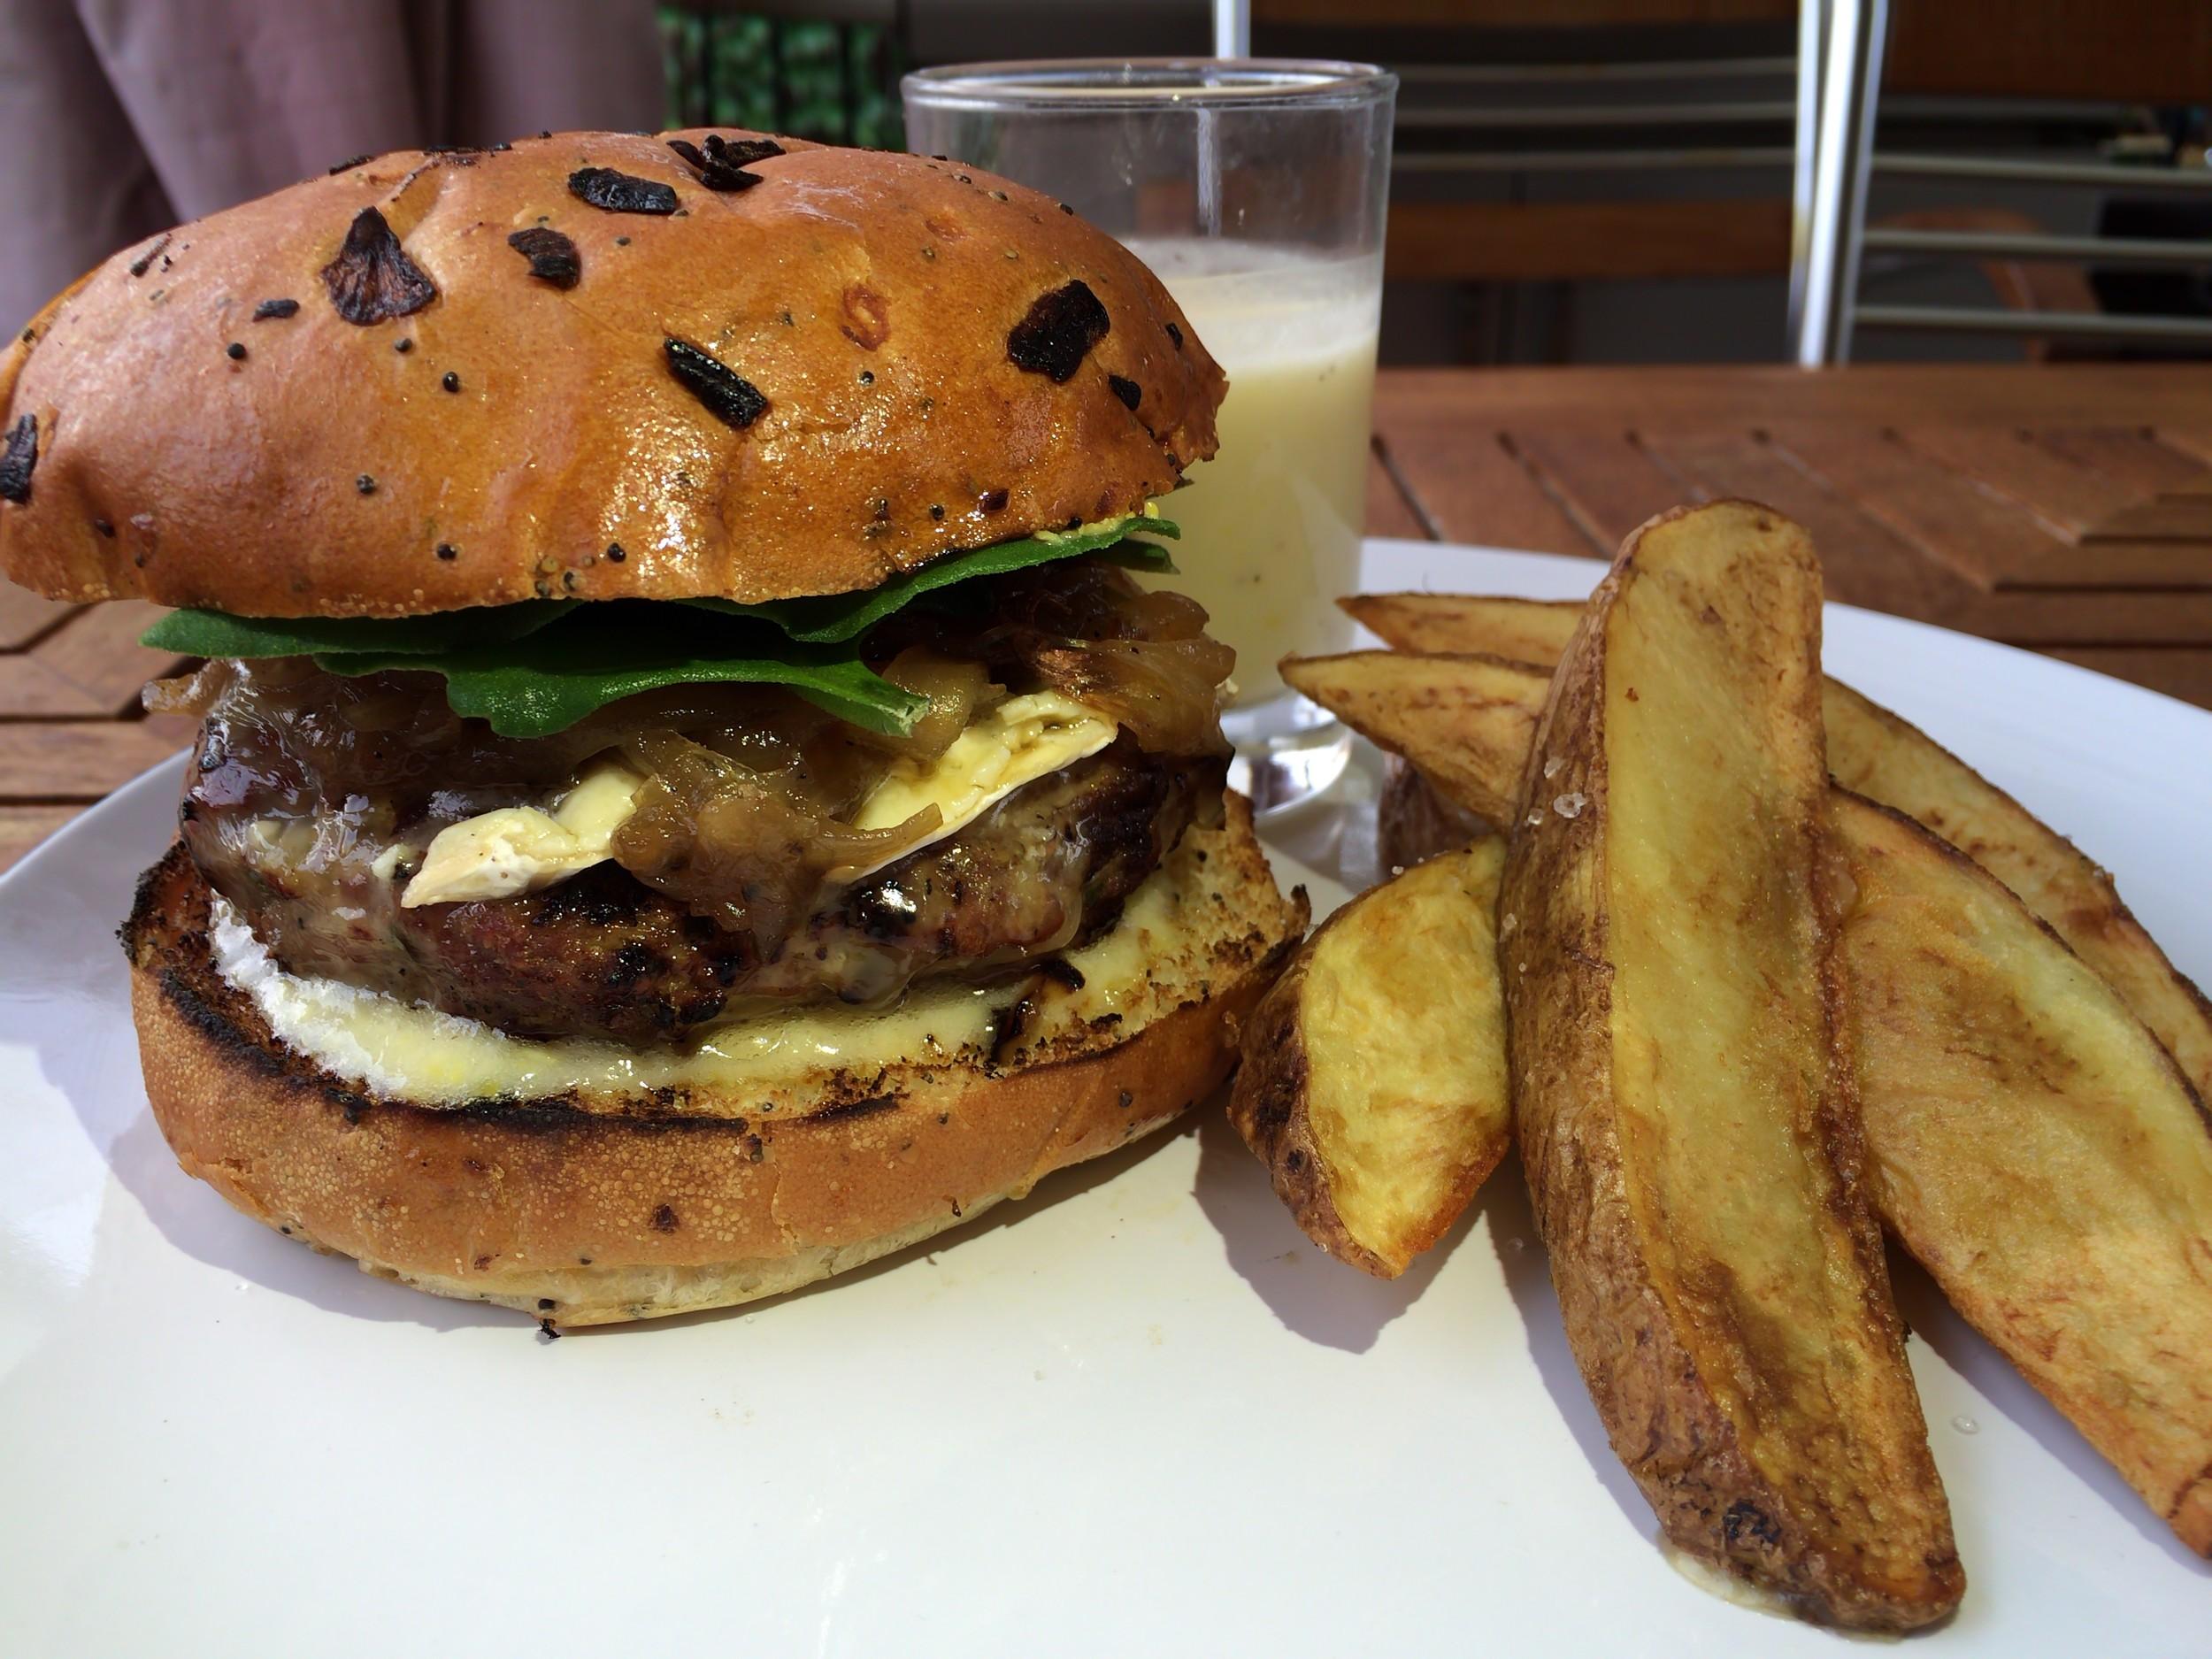 Burger, Maple, Caramelized Onions, Fries, Brie, Horseradish, Aioli